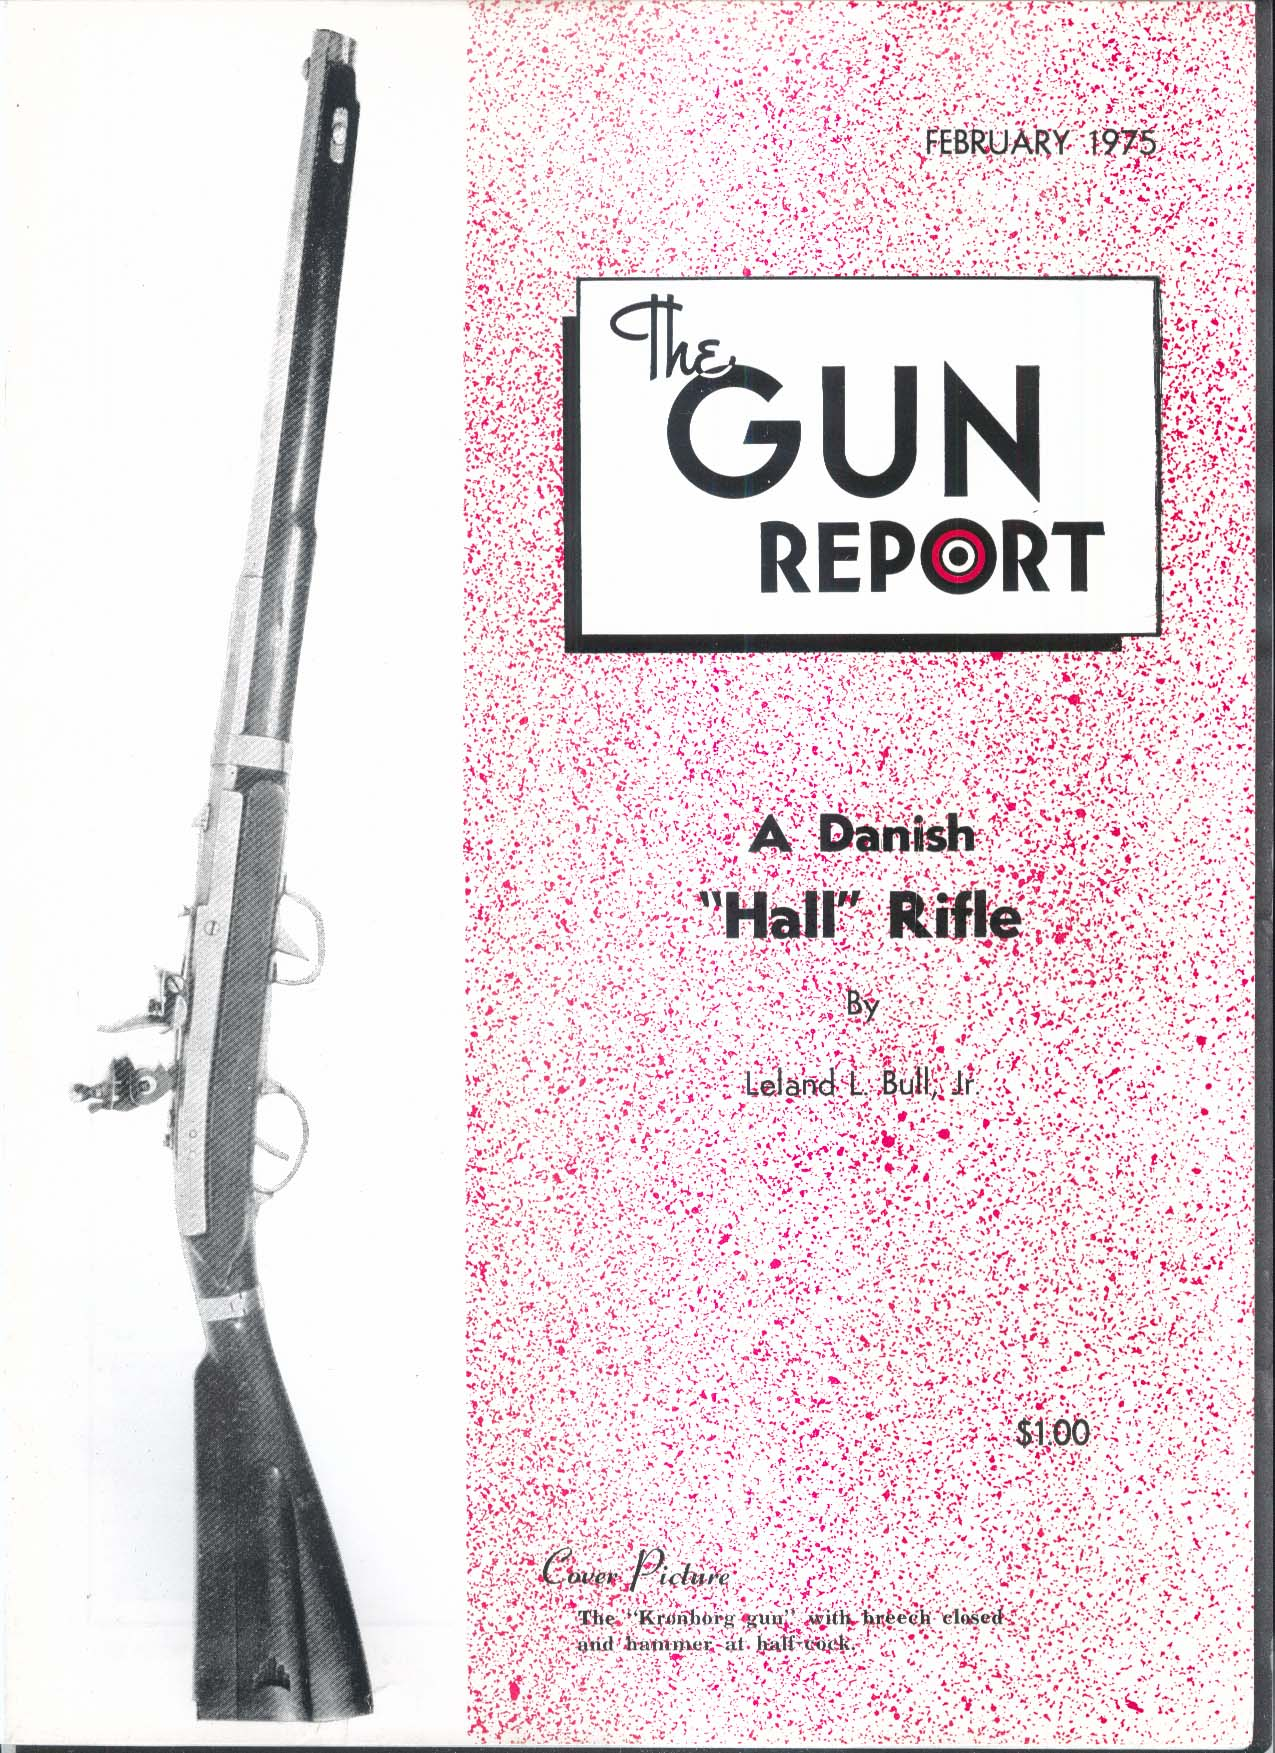 GUN REPORT Danish Hall Rifle Kronborg Gun + 2 1975